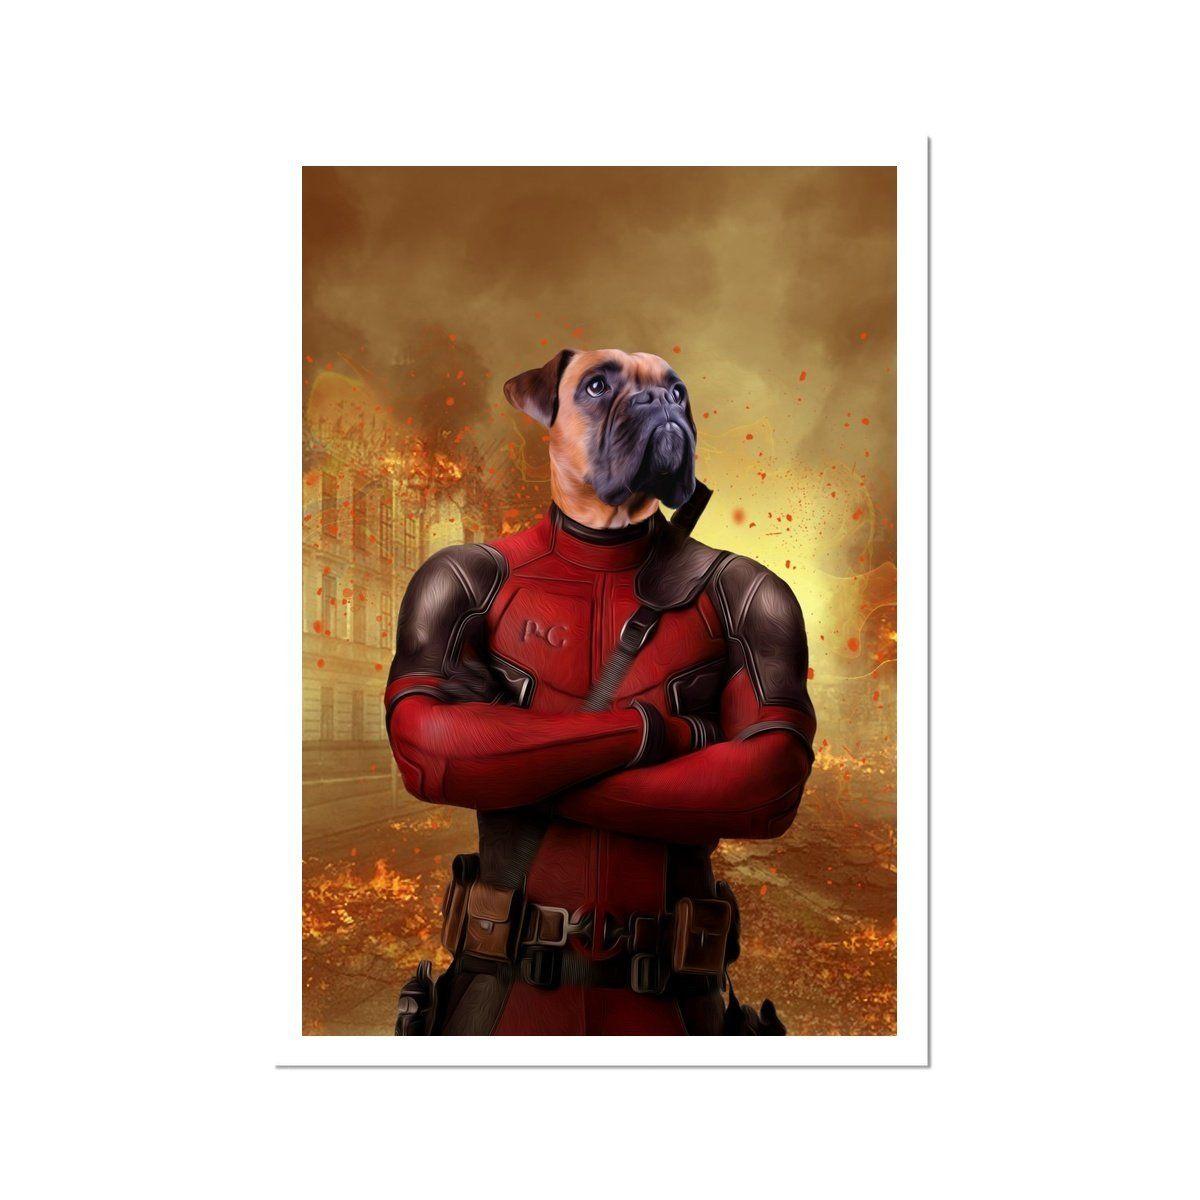 The Deadpawl: Custom Pet Poster - A3 Portrait